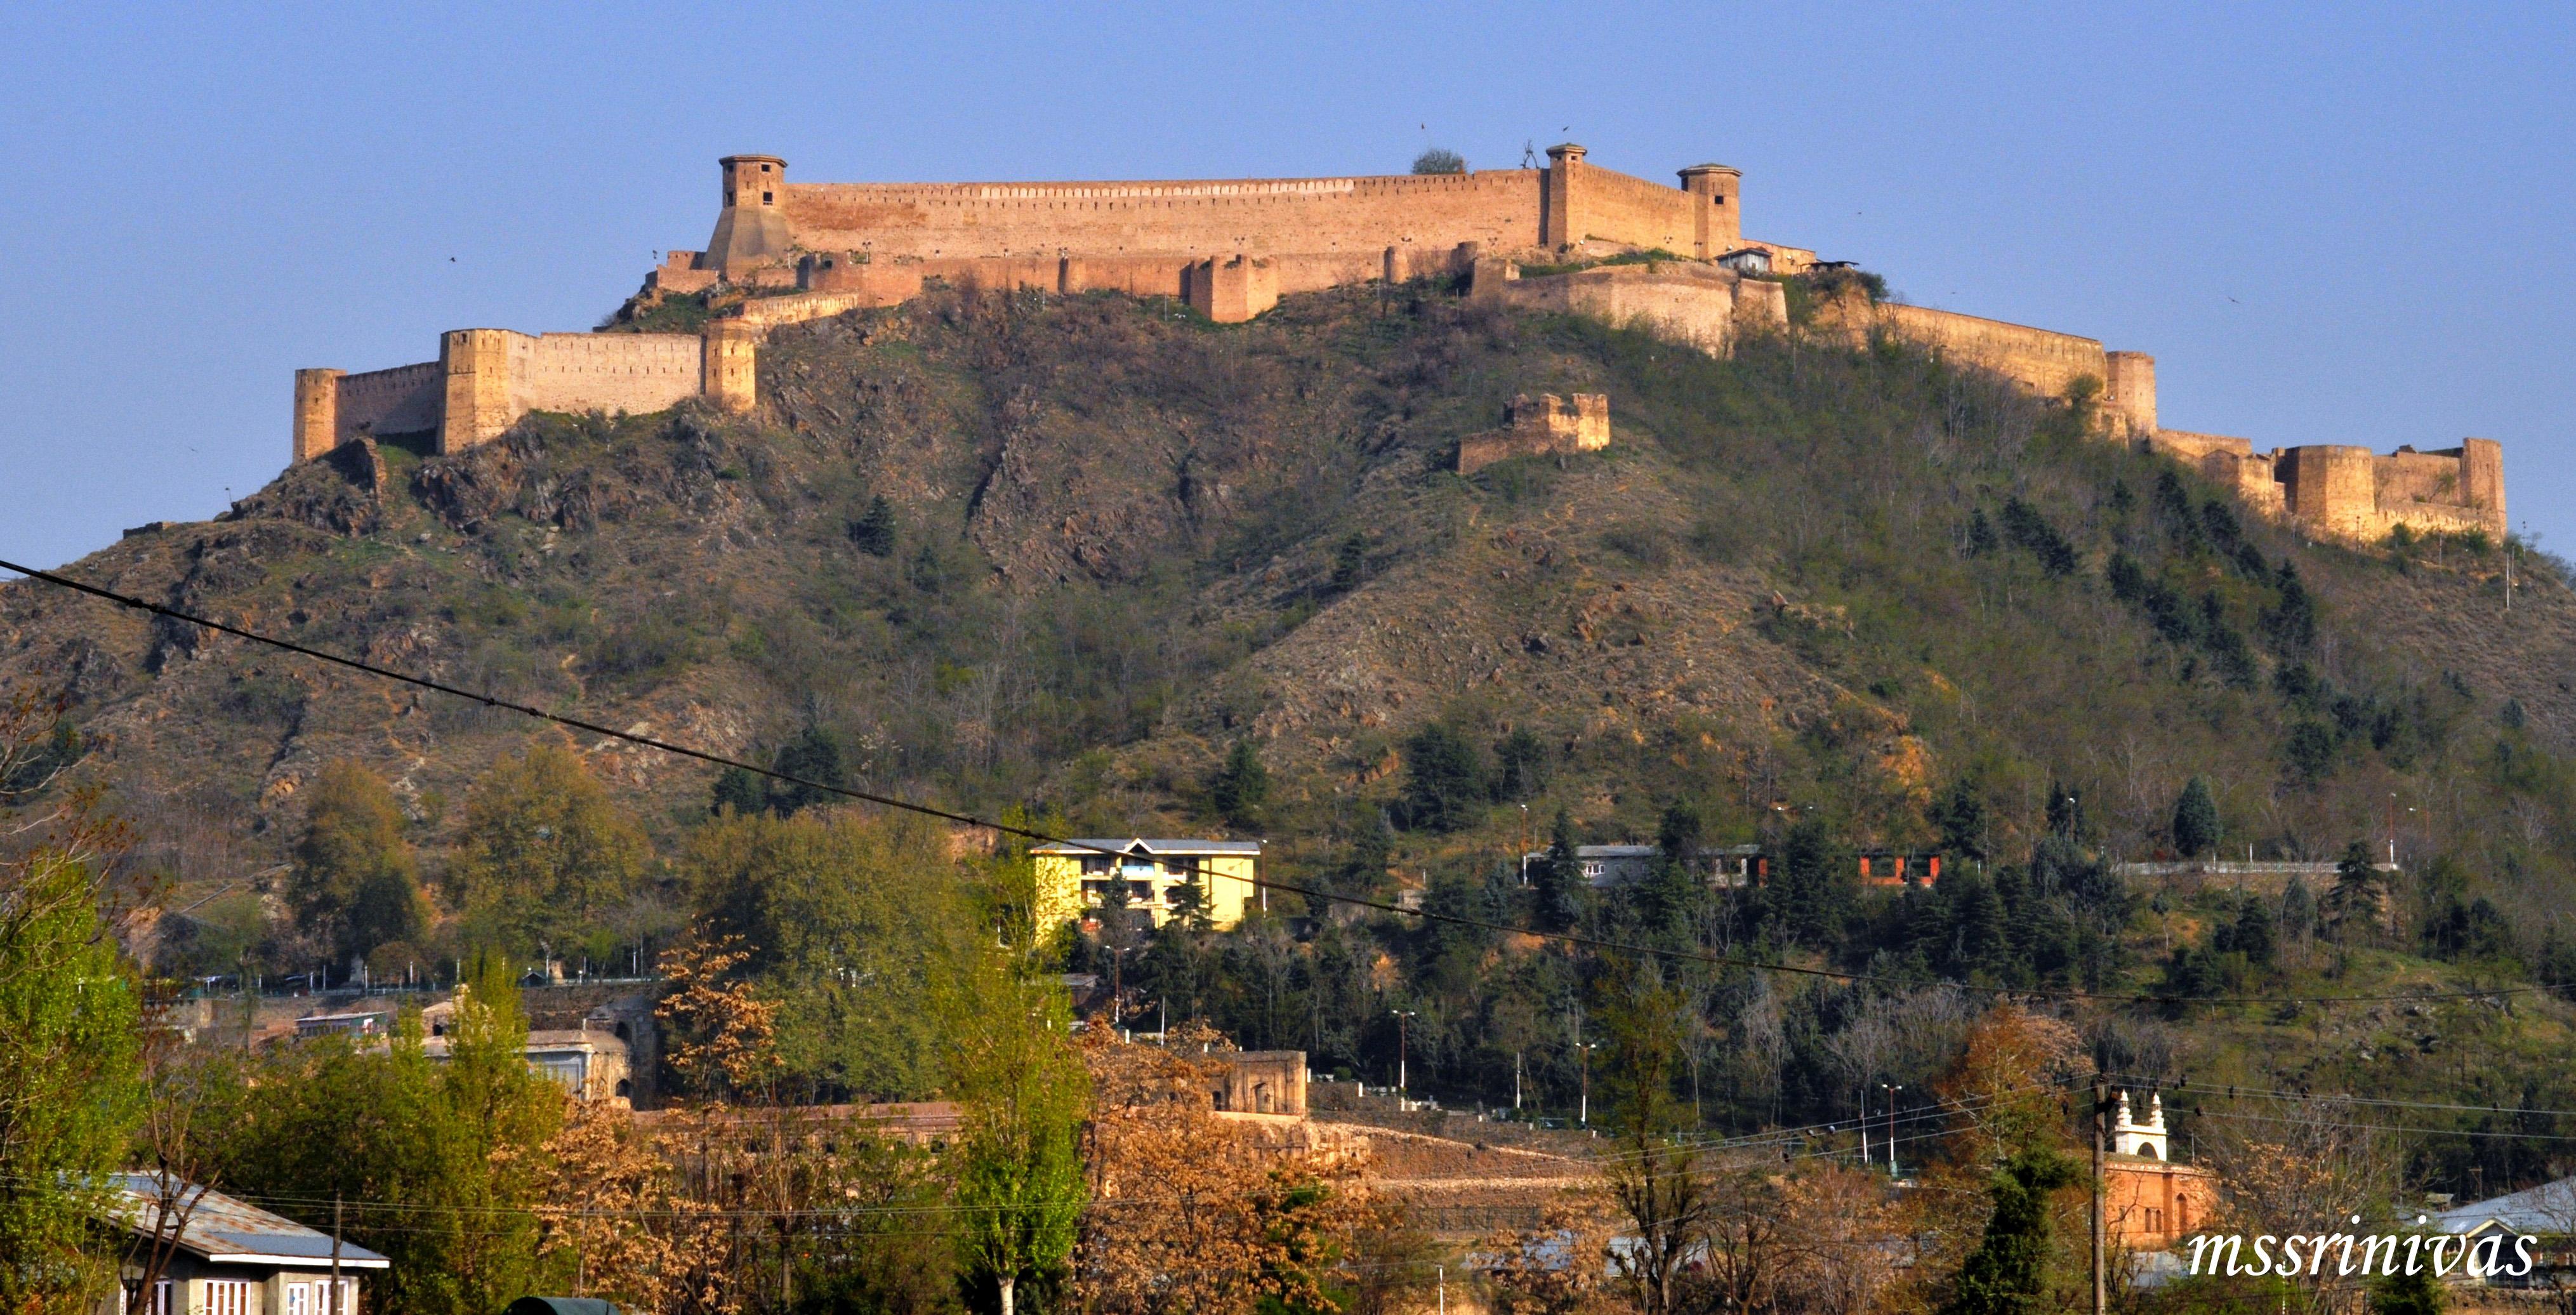 Kashmir tourism photo gallery